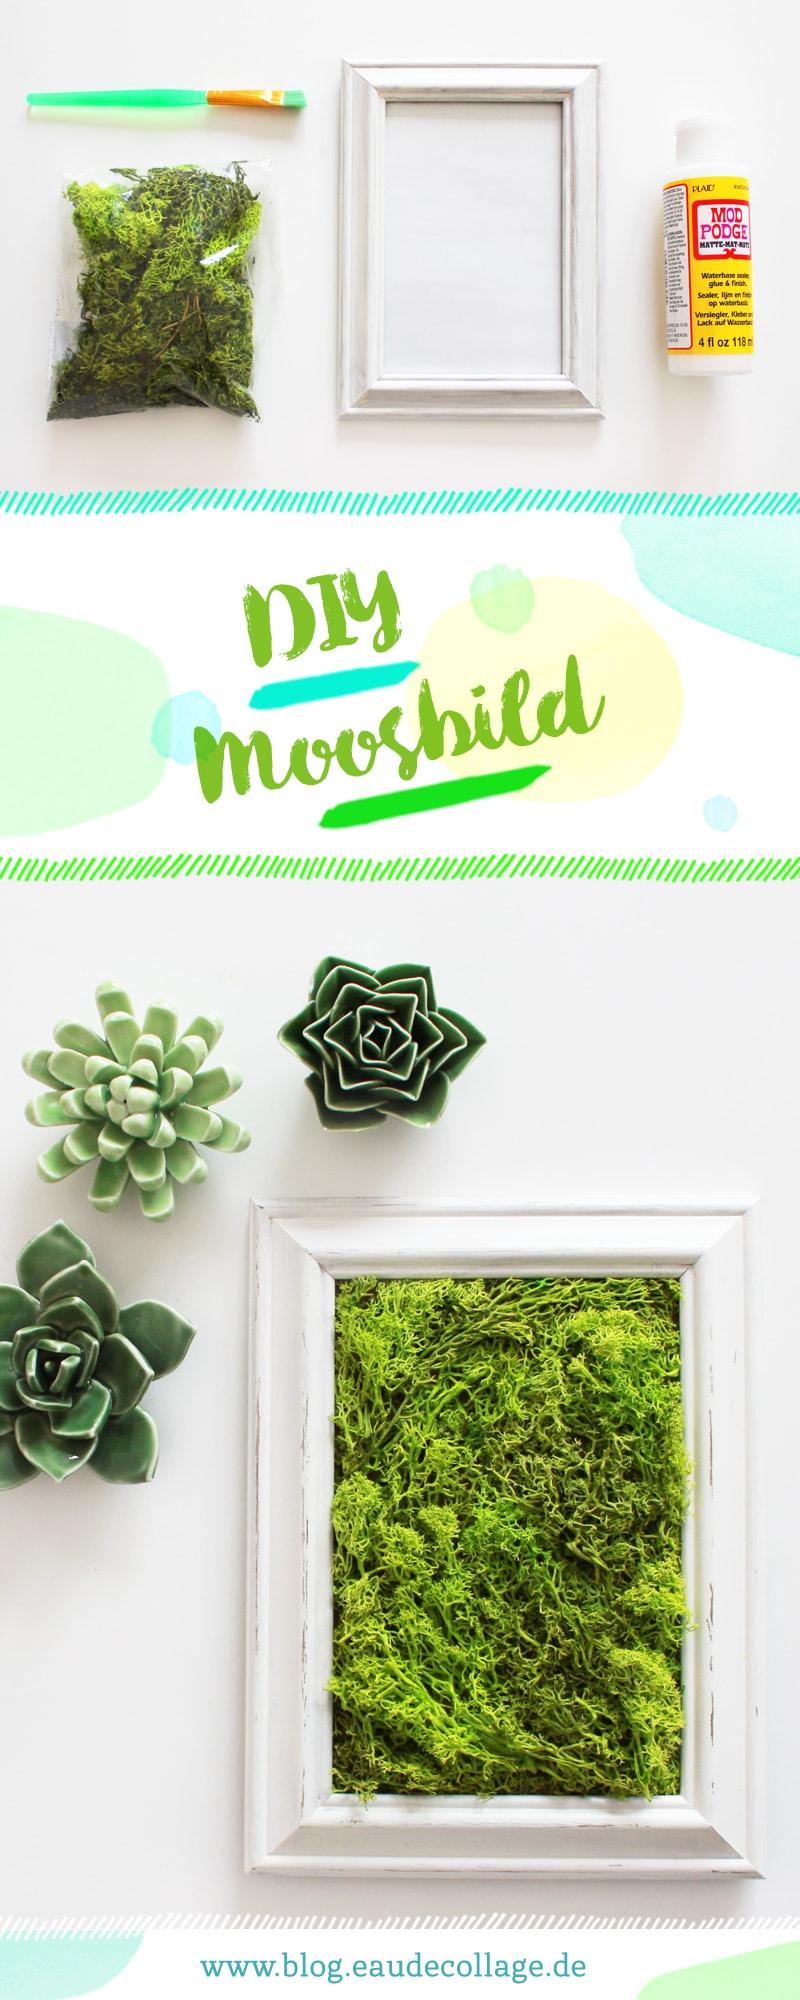 DIY MOOSBILD SELBER MACHEN / WANDDEKO MIT ISLANDMOOS ...